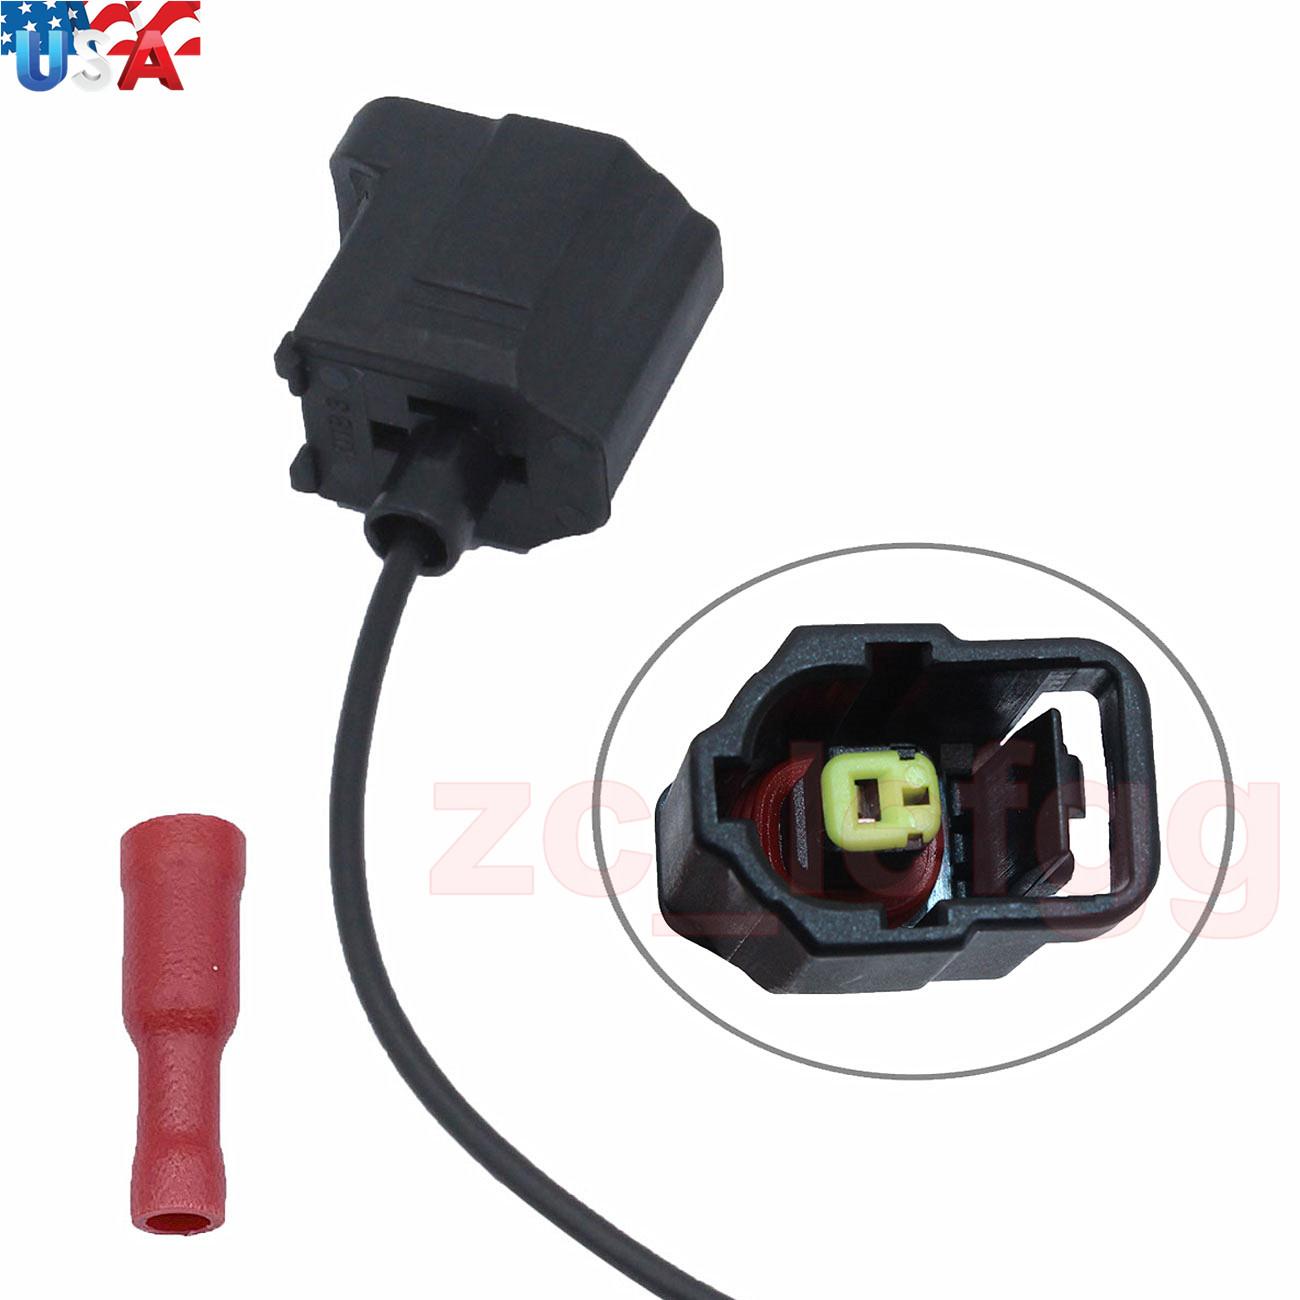 For 6.0L 6.4L Ford Powerstroke Diesel Engine Oil Pressure Switch Sensor Pigtail